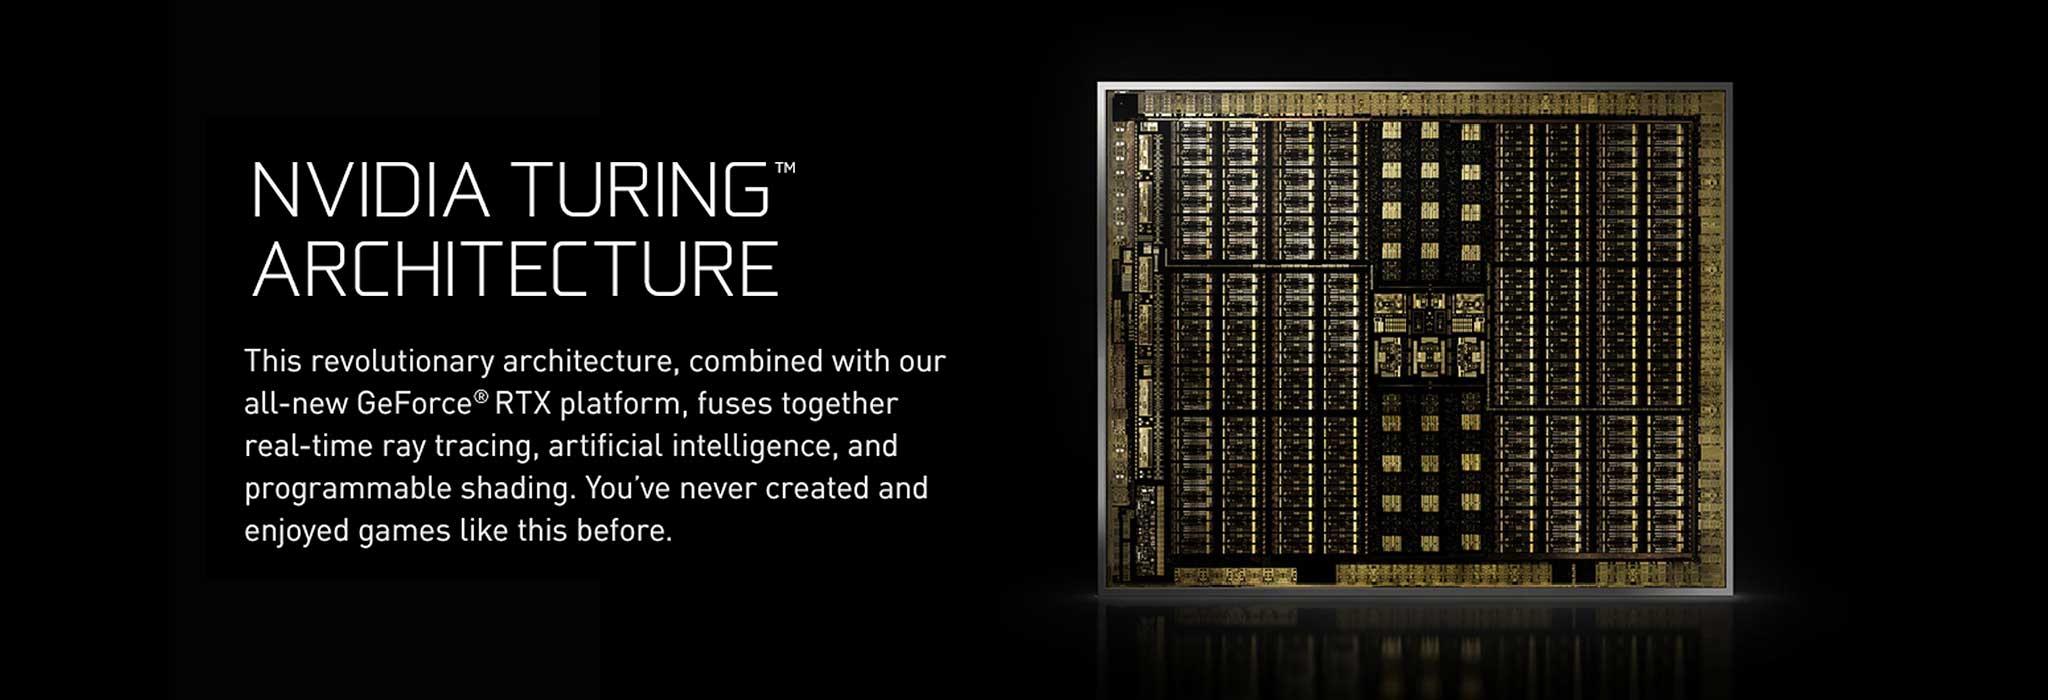 AORUS GeForce® RTX 2080 SUPER™ 8G | Graphics Card - GIGABYTE